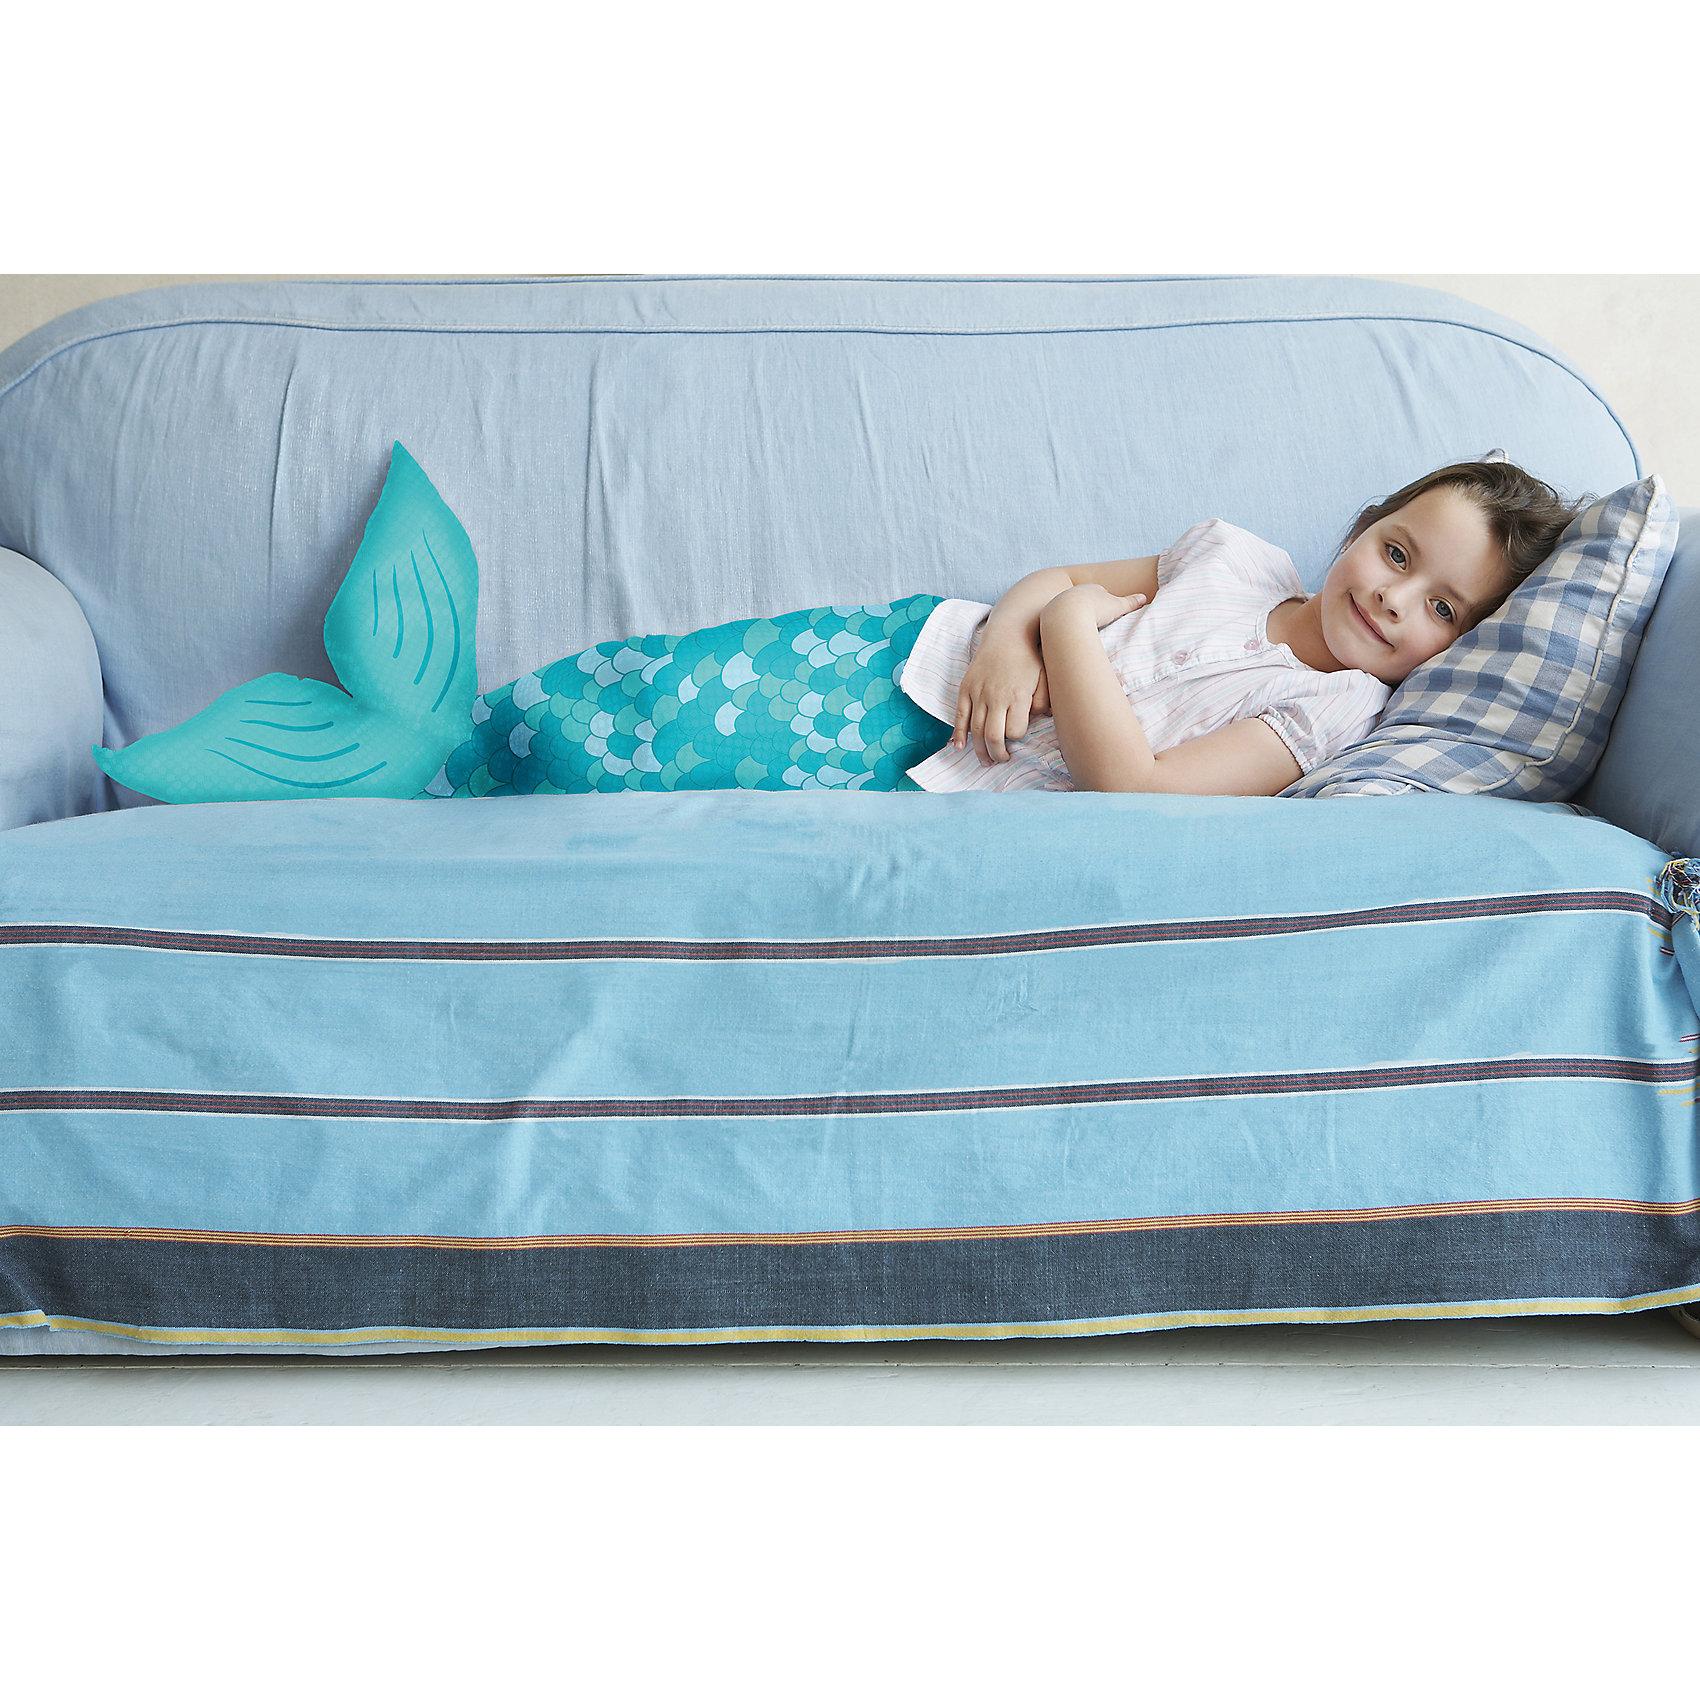 Neu ACHOKA® Kuscheldecke Snuggle Hai 8685656 blau türkis